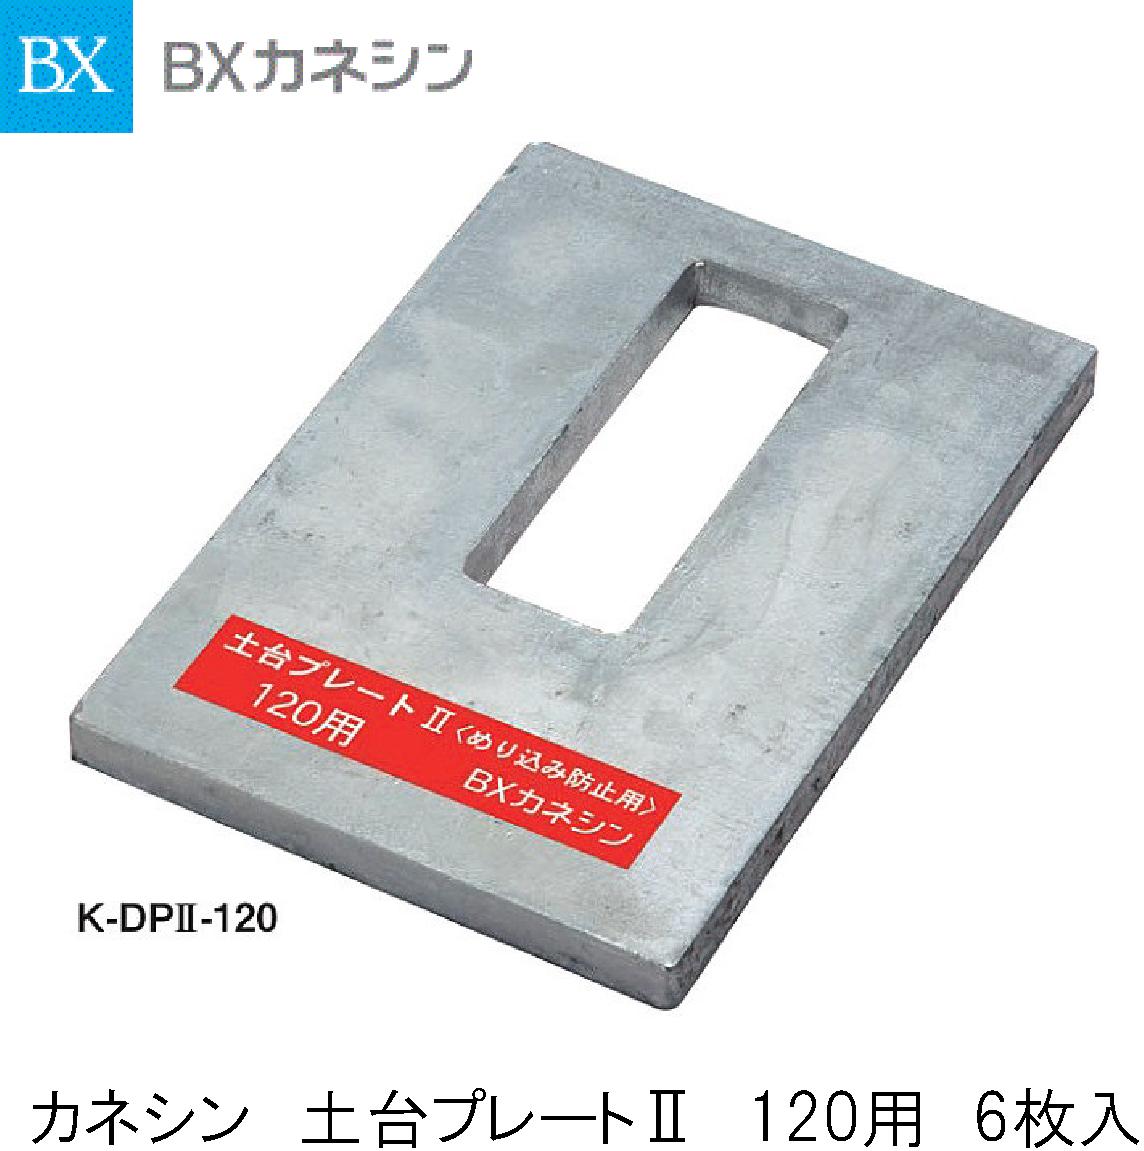 BXカネシン【土台プレート2(めり込み防止用) 120用 K-DP2-120 6枚入】